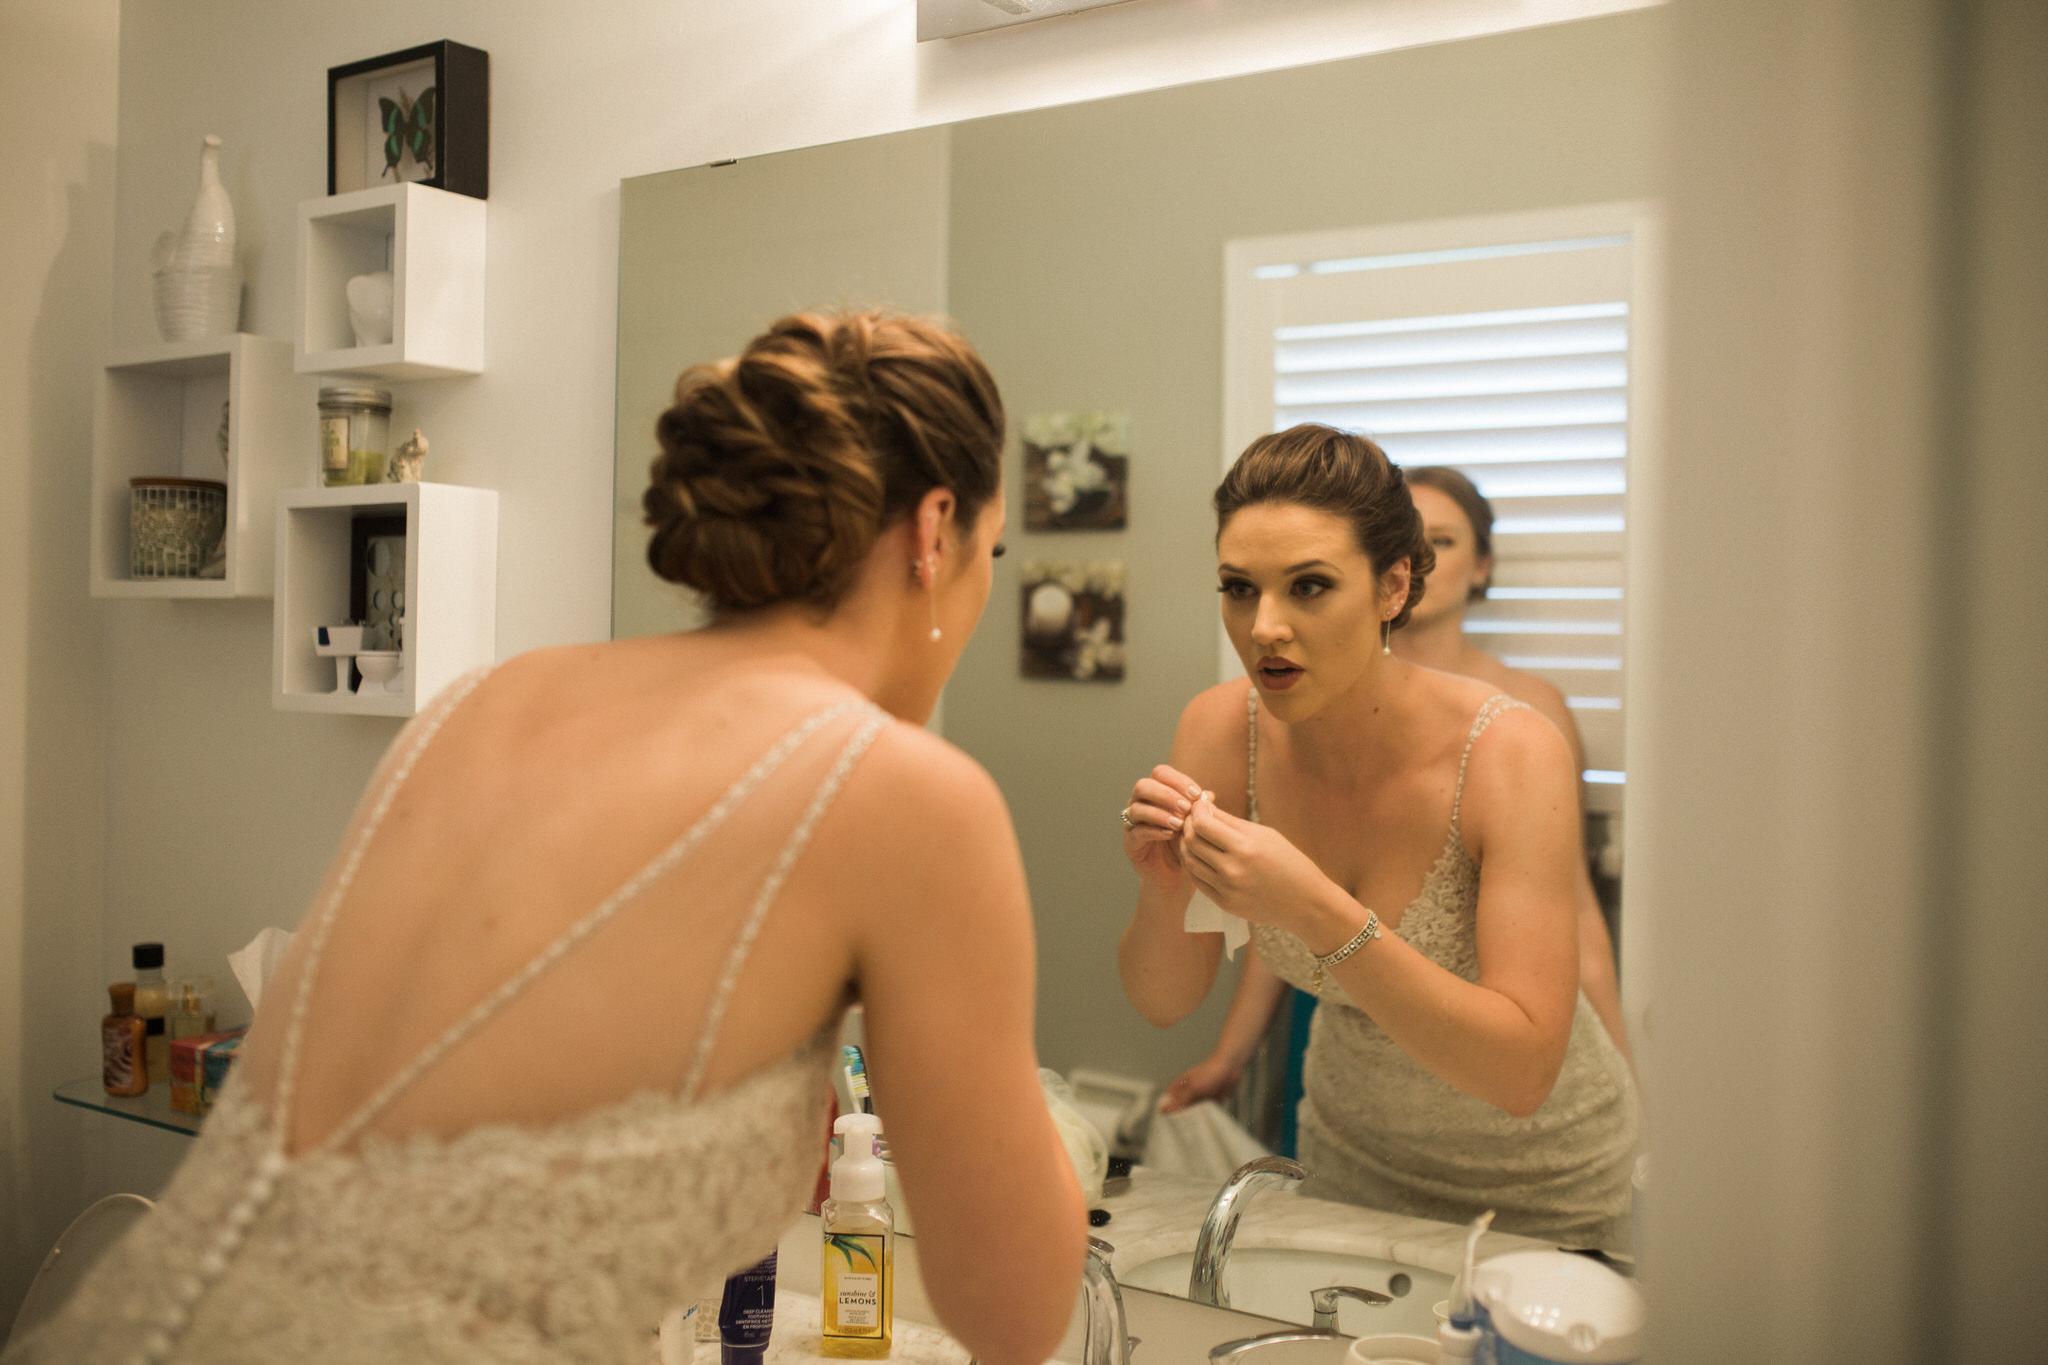 Whitby Documentary Wedding Photographer Carol Poitras - bride in mirror